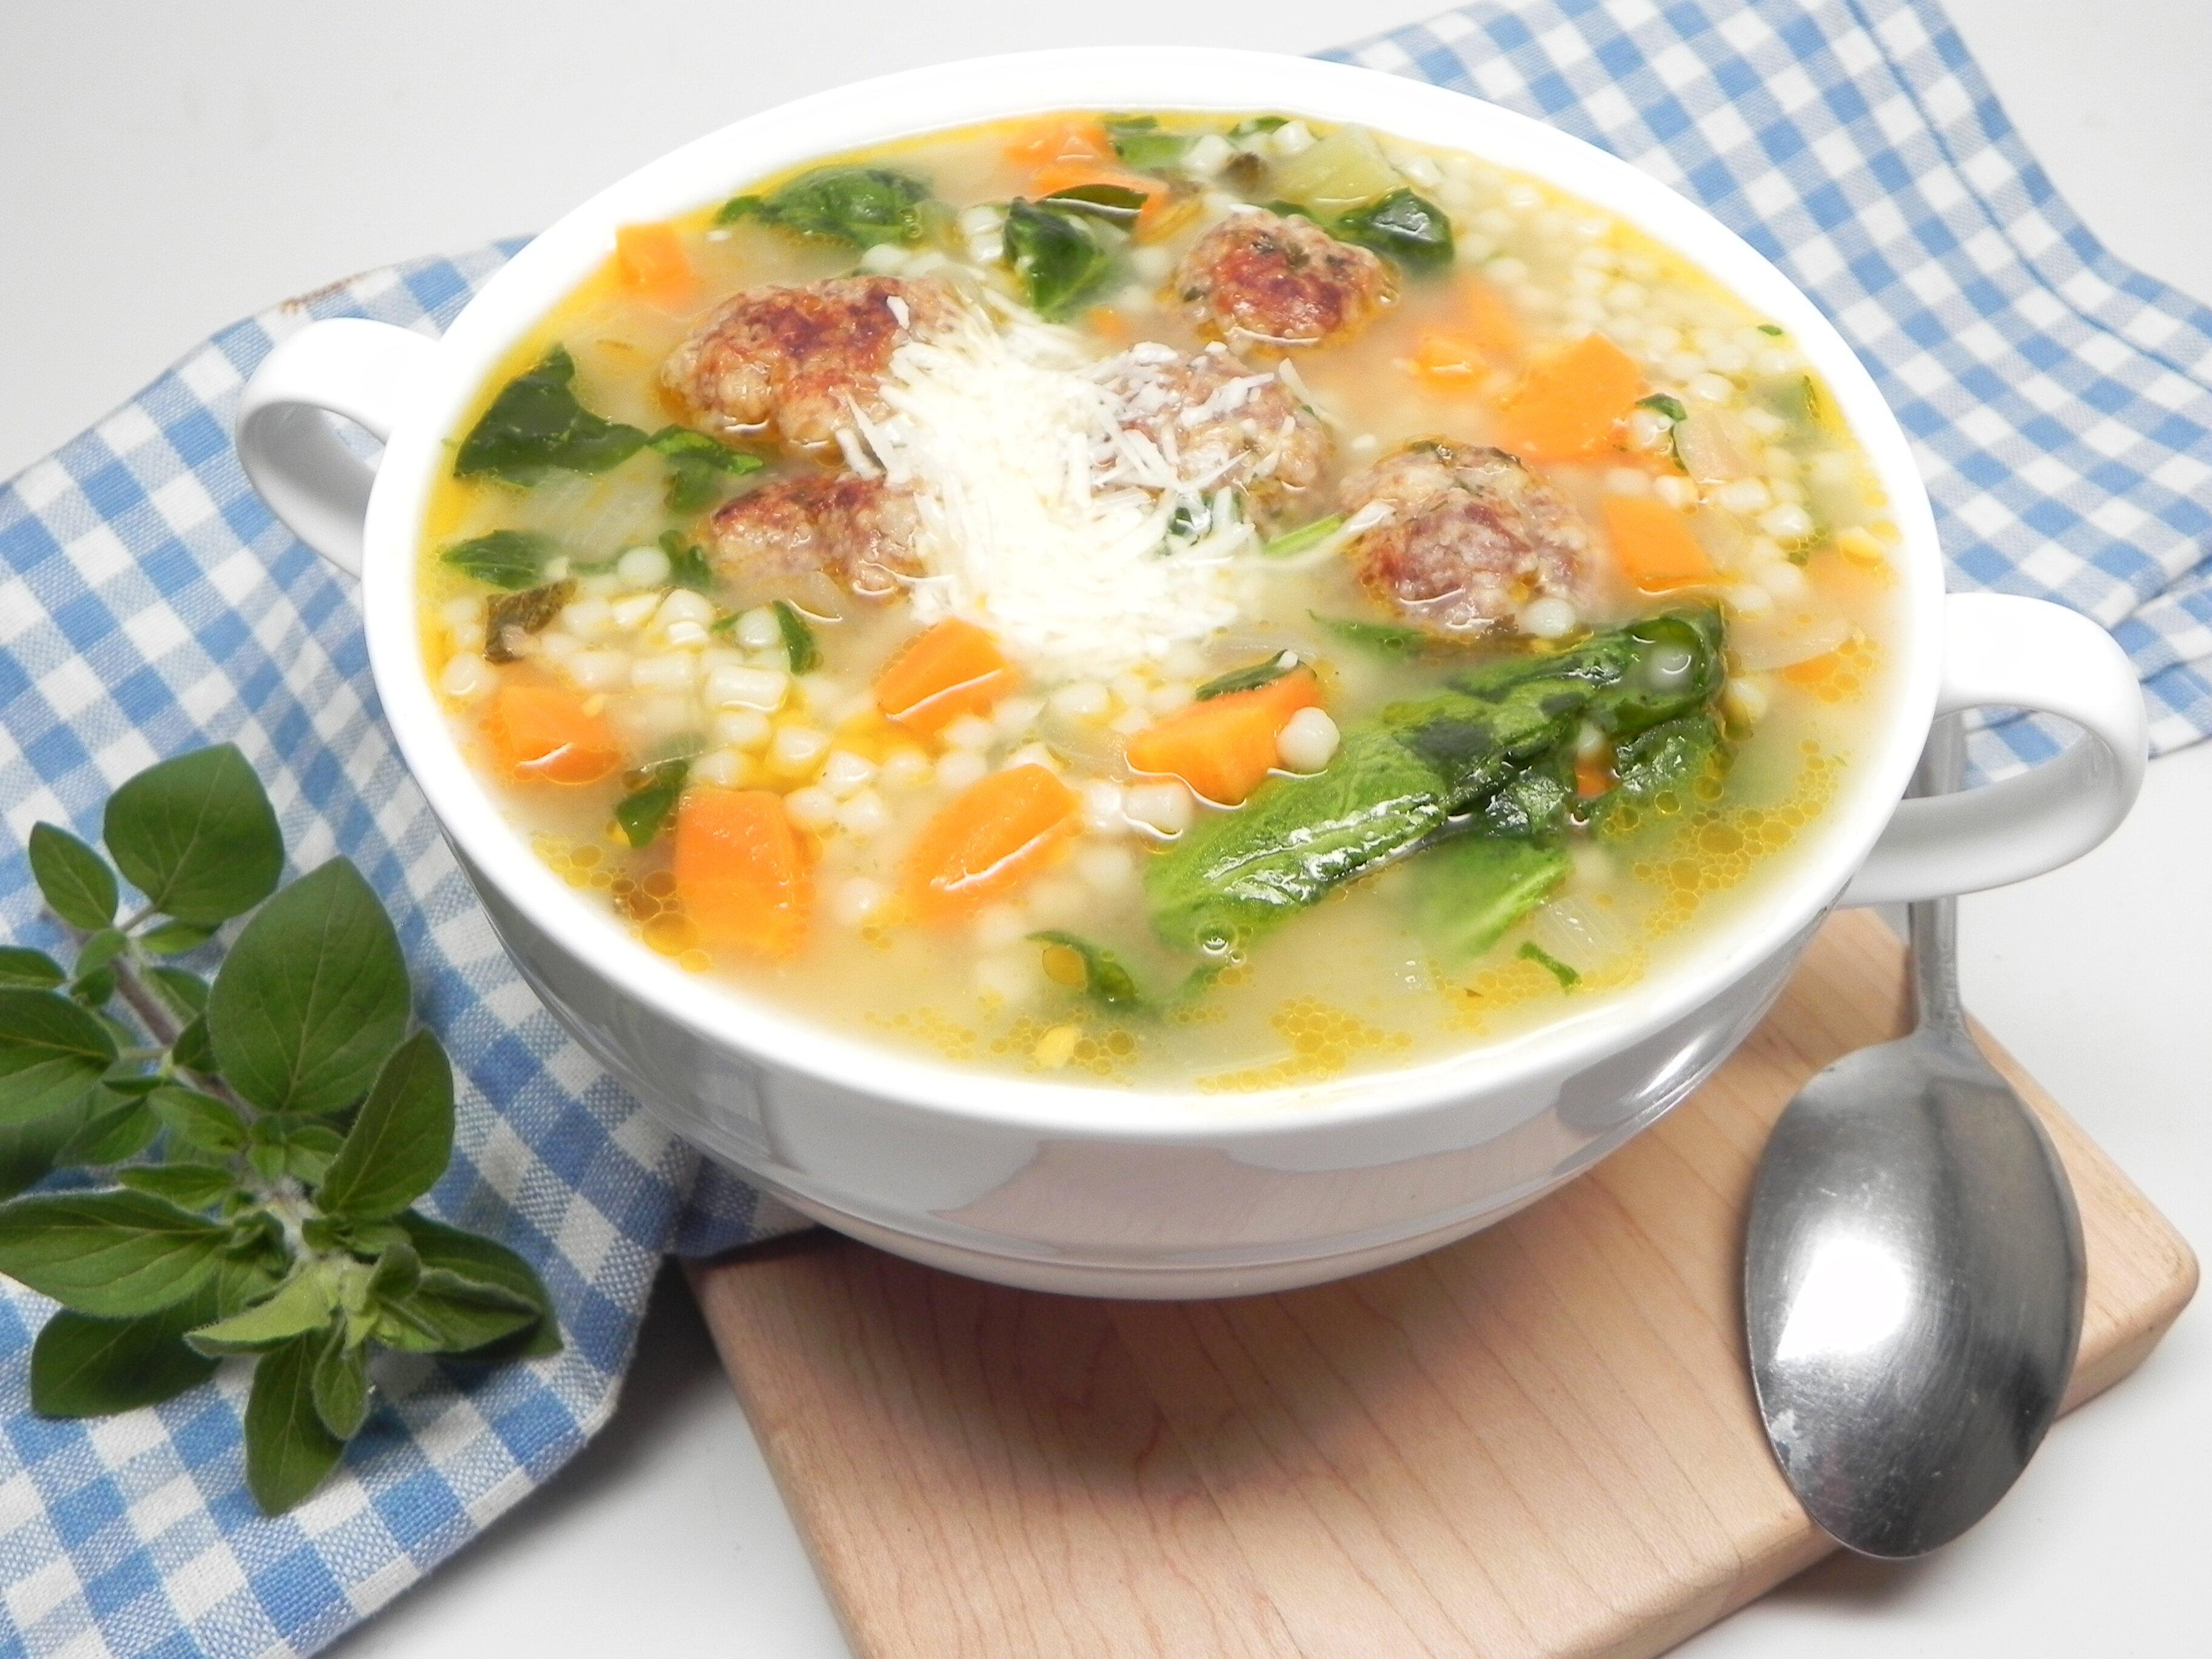 italian wedding soup with venison meatballs recipe